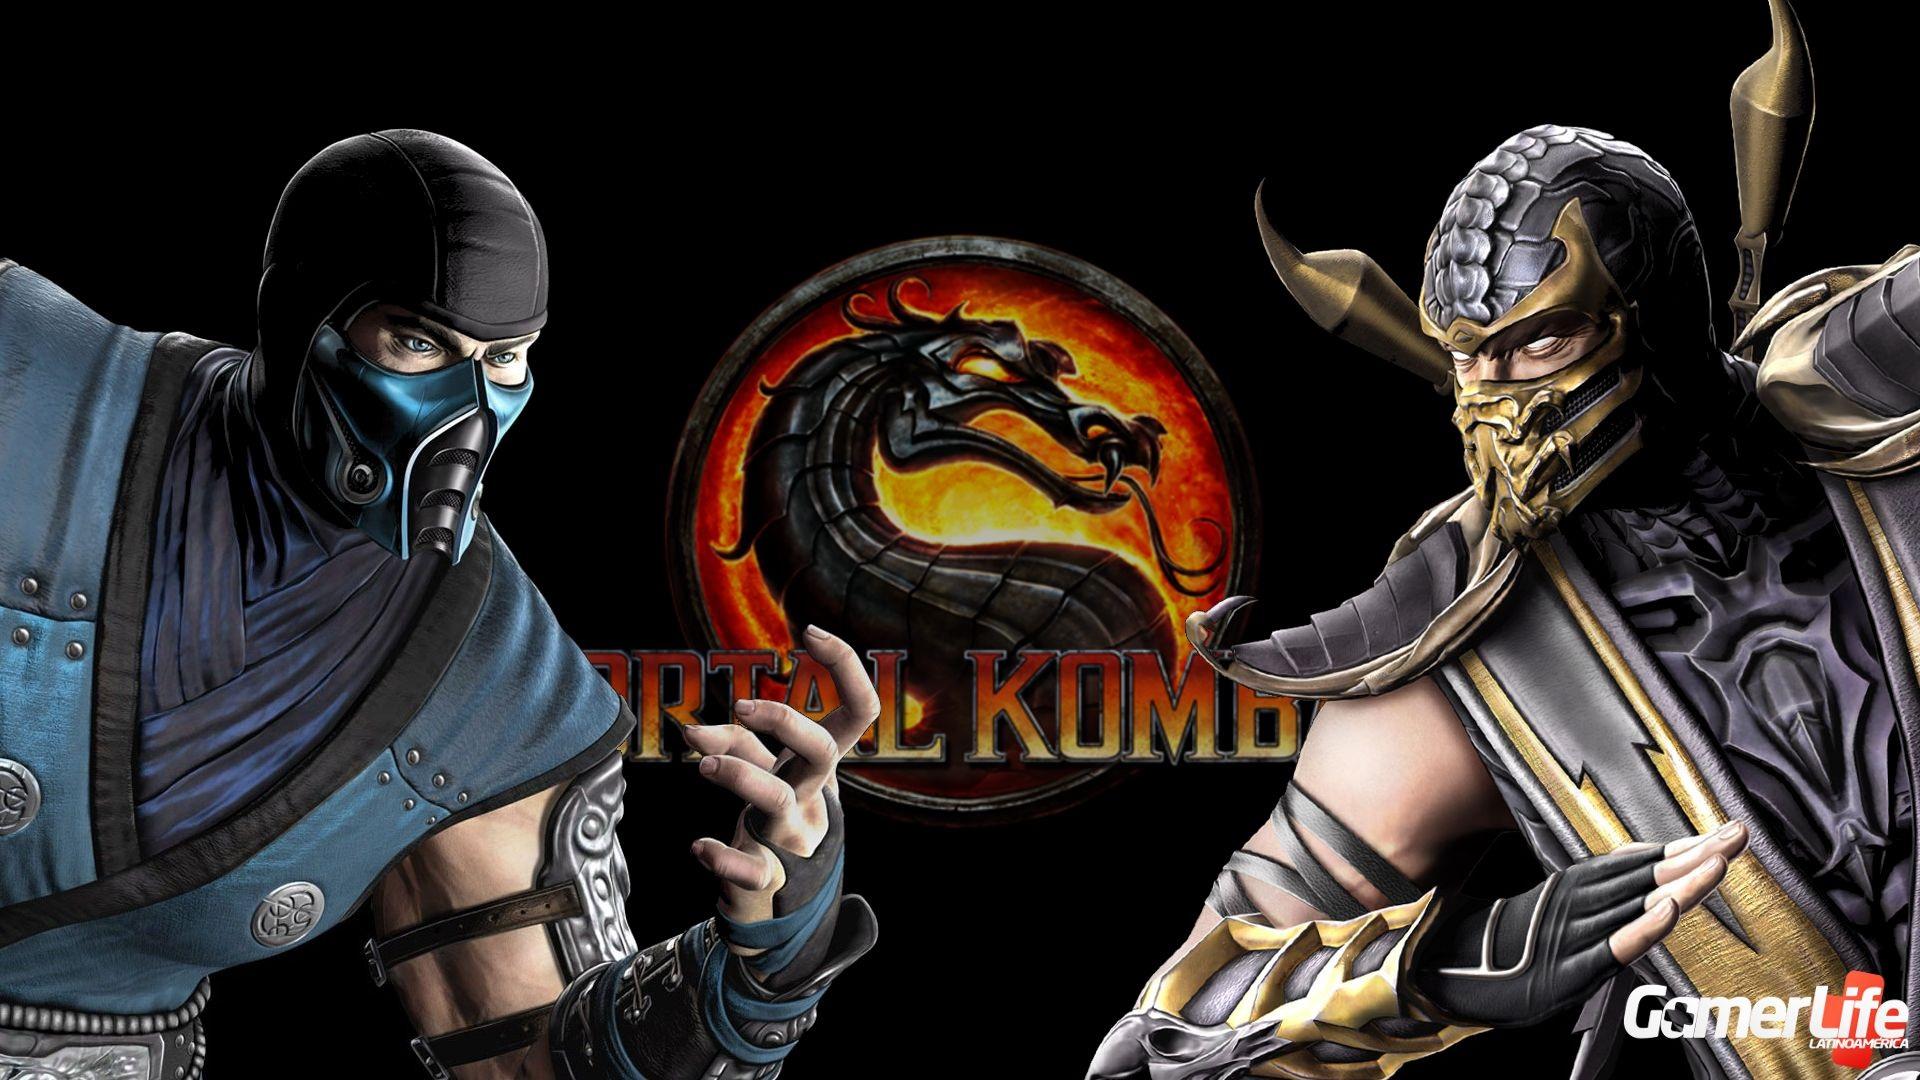 Mk9 wallpaper   Mortal Kombat 9 komplete Edition Wallpaper 1920x1080